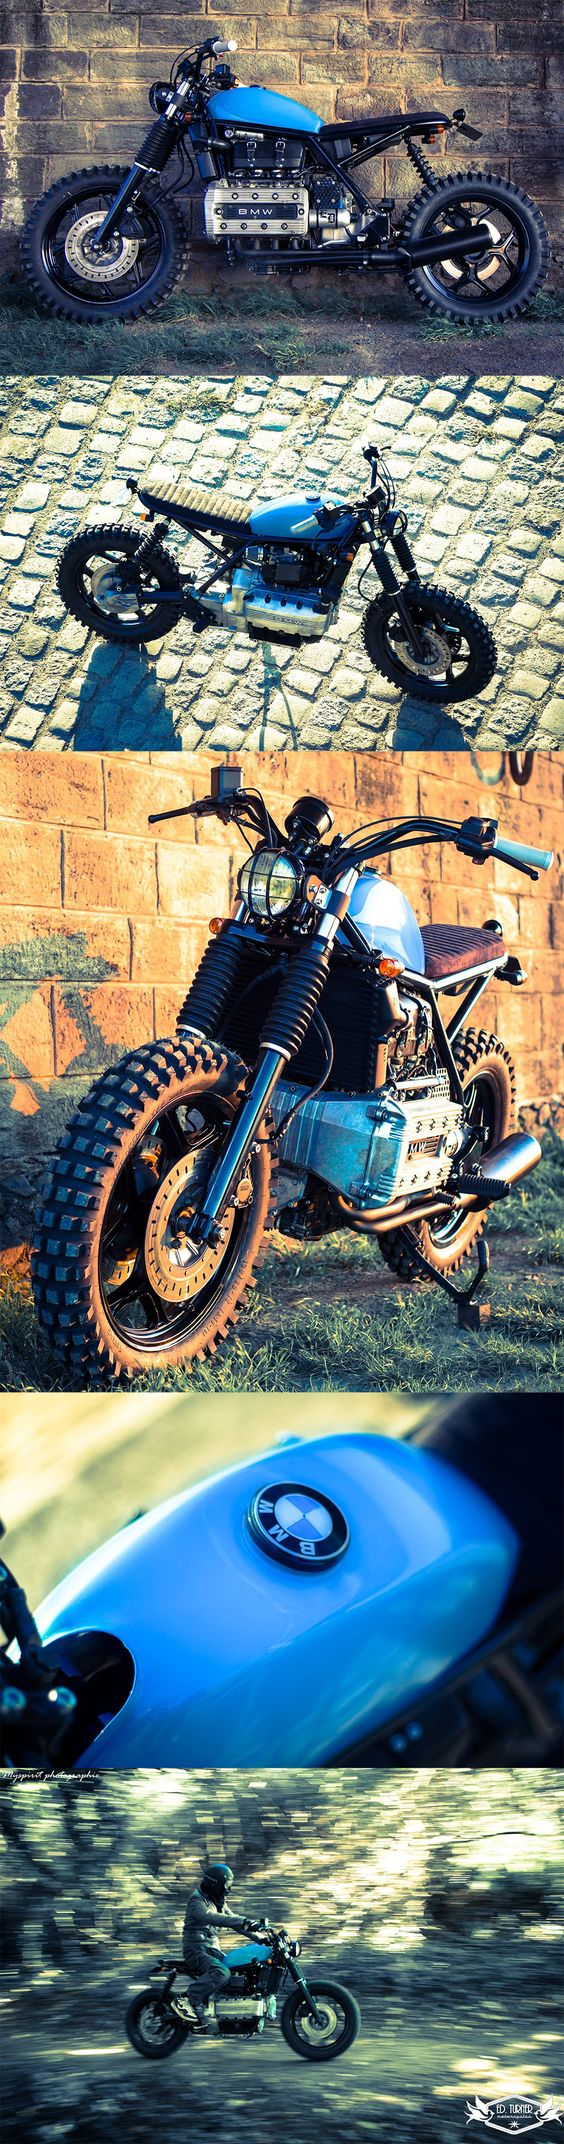 BMW K100 Scrambler by Ed Turner Motorcycles